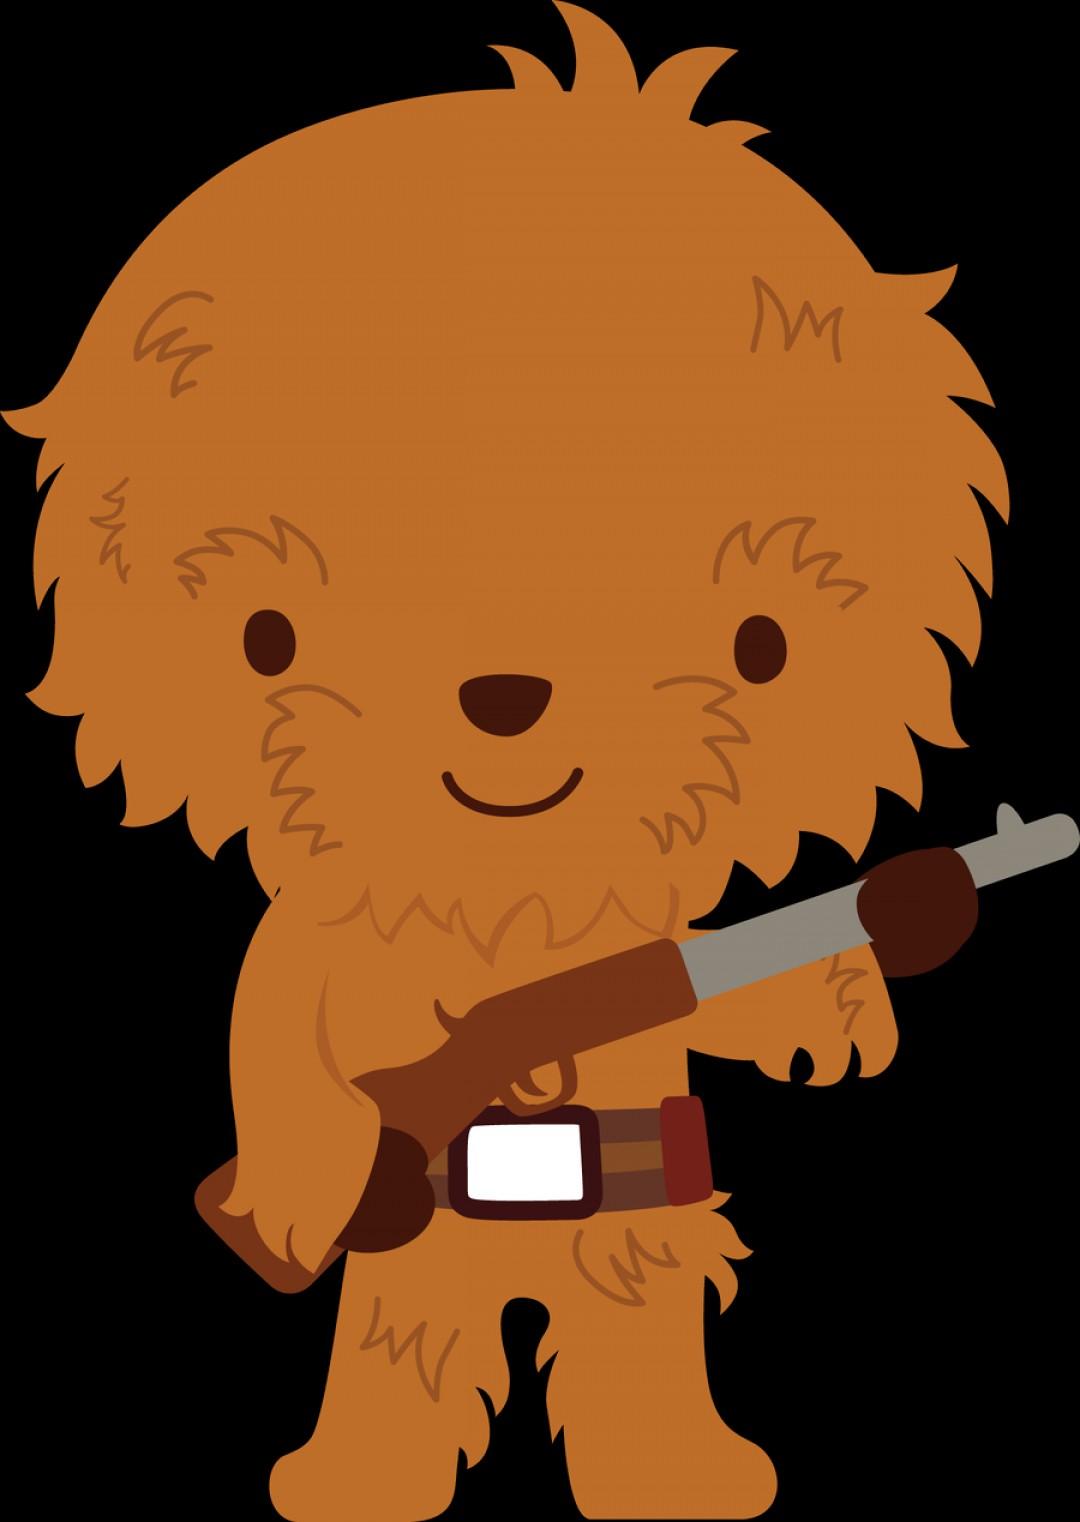 Of star wars chewie. Chewbacca clipart cartoon